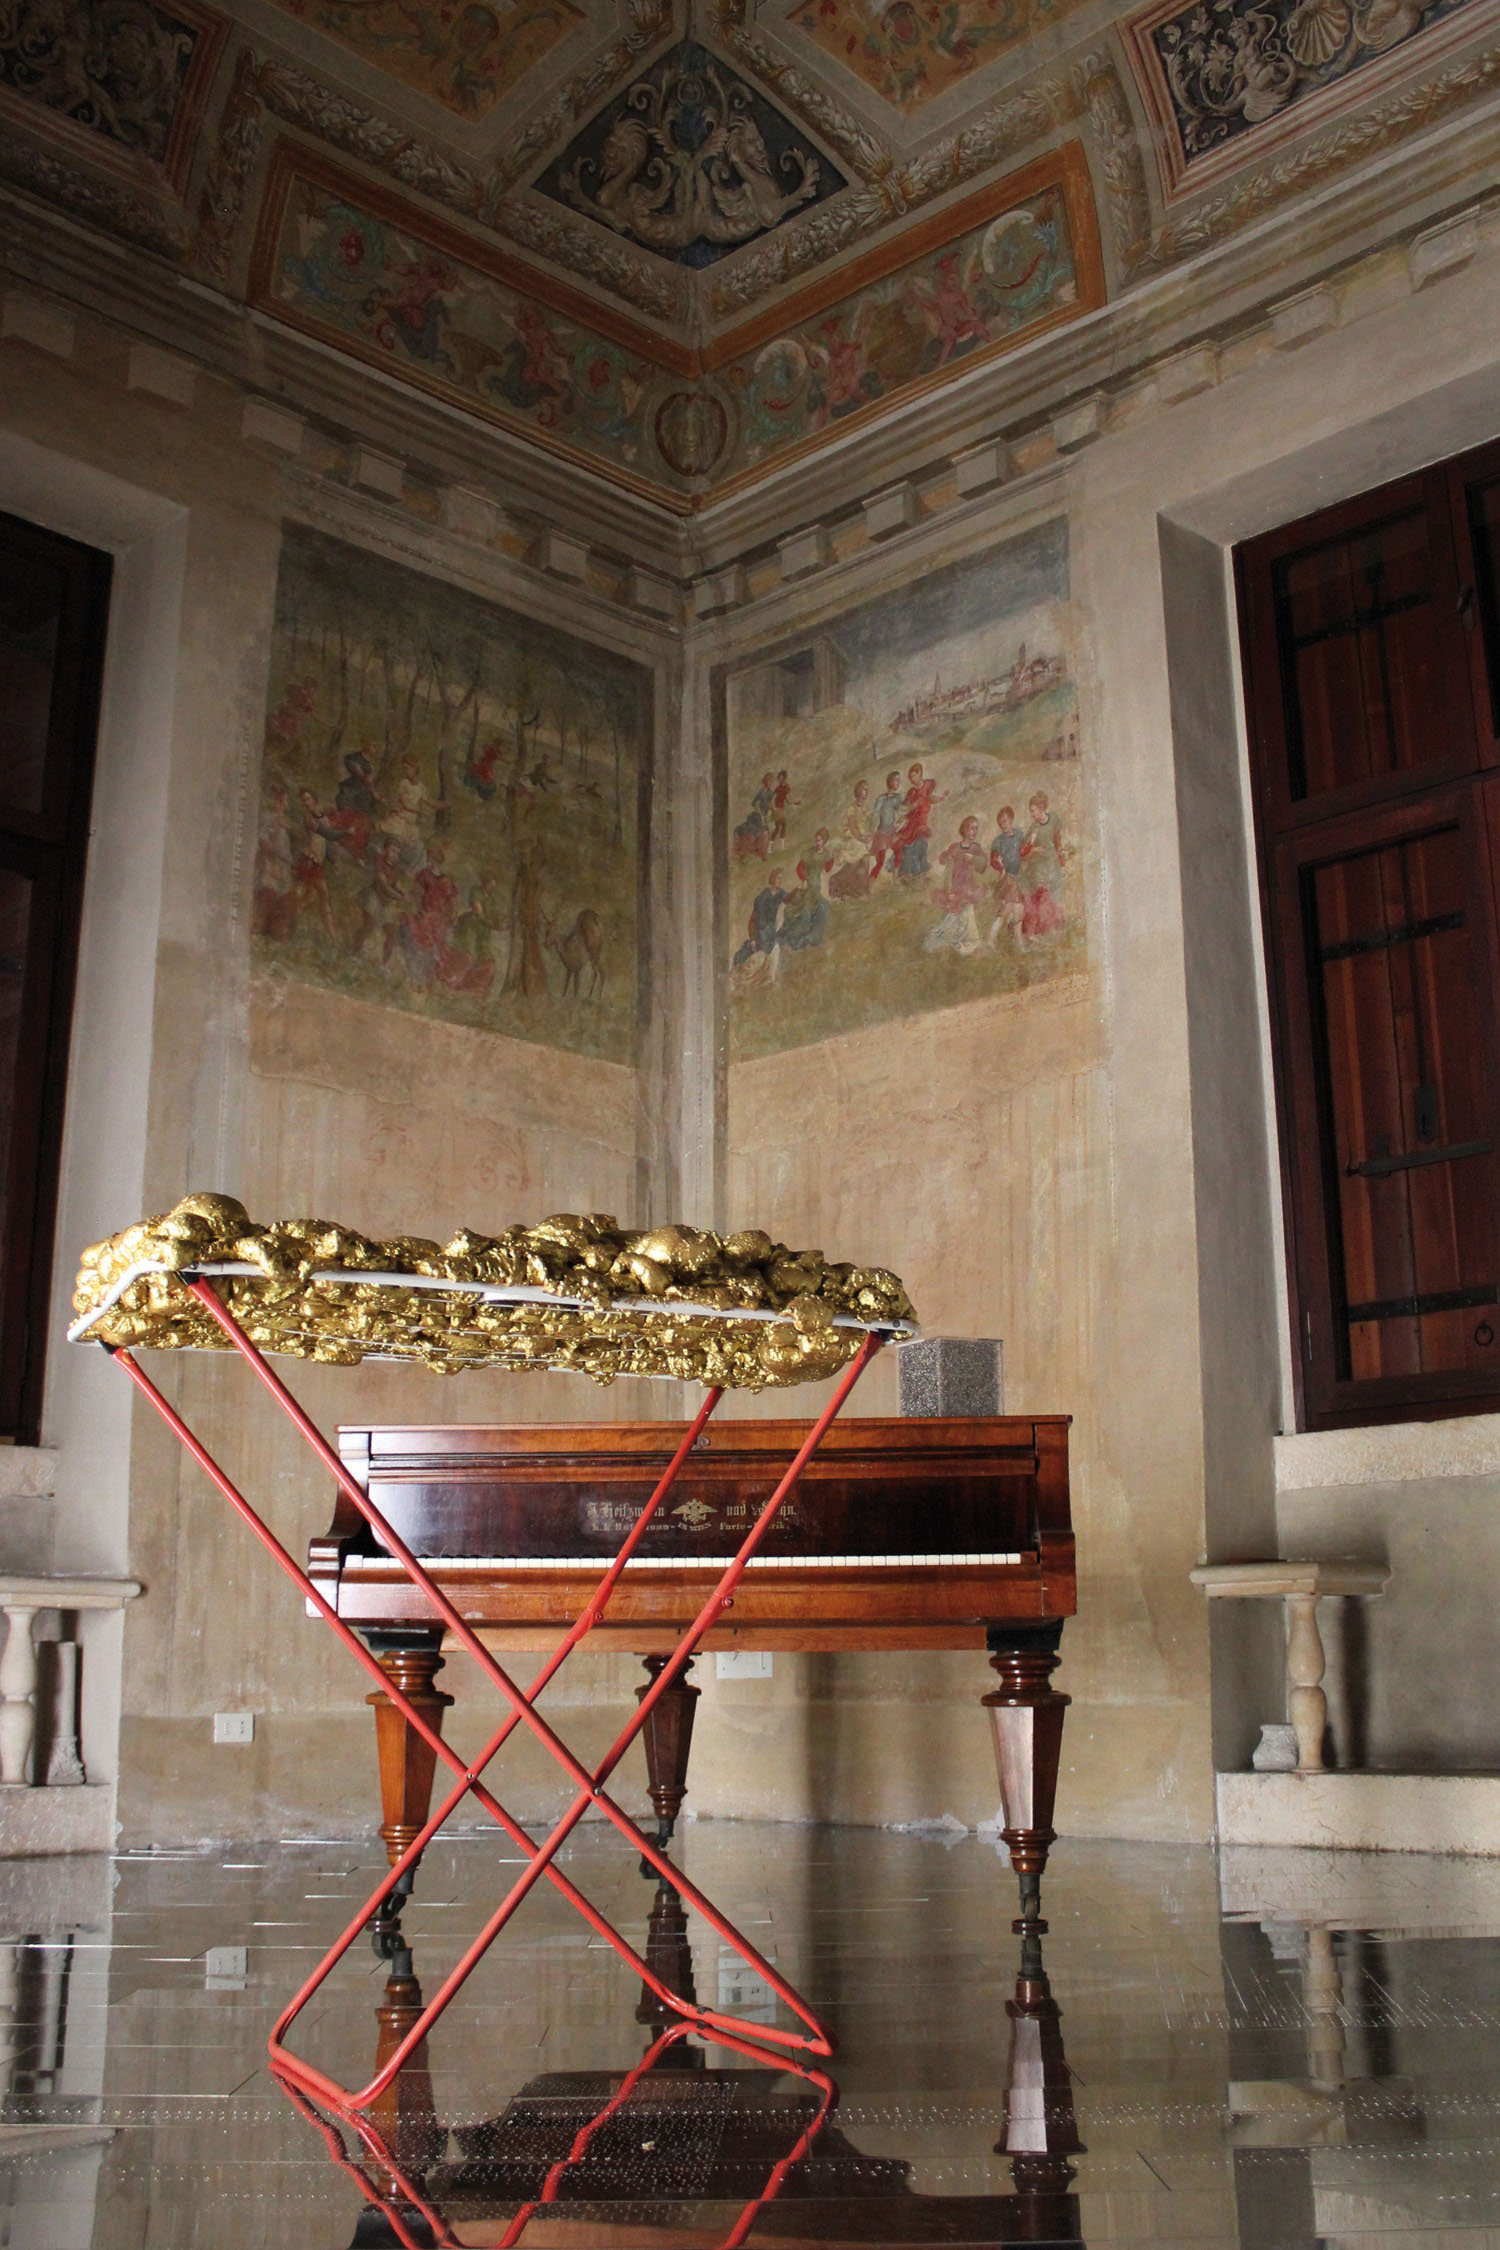 © Wilhelm Roseneder. Goldene Erweiterung/Golden expansion, 2005/2009. Villa Pisani Bonetti, 2012. Skulptur. Polyurethan, Acryllack auf Metall (Wäschetrockner)/Sculpture. Polyurethane, acrylic varnish on metal (clothes-dryer), 1.11x1.12x60 cm